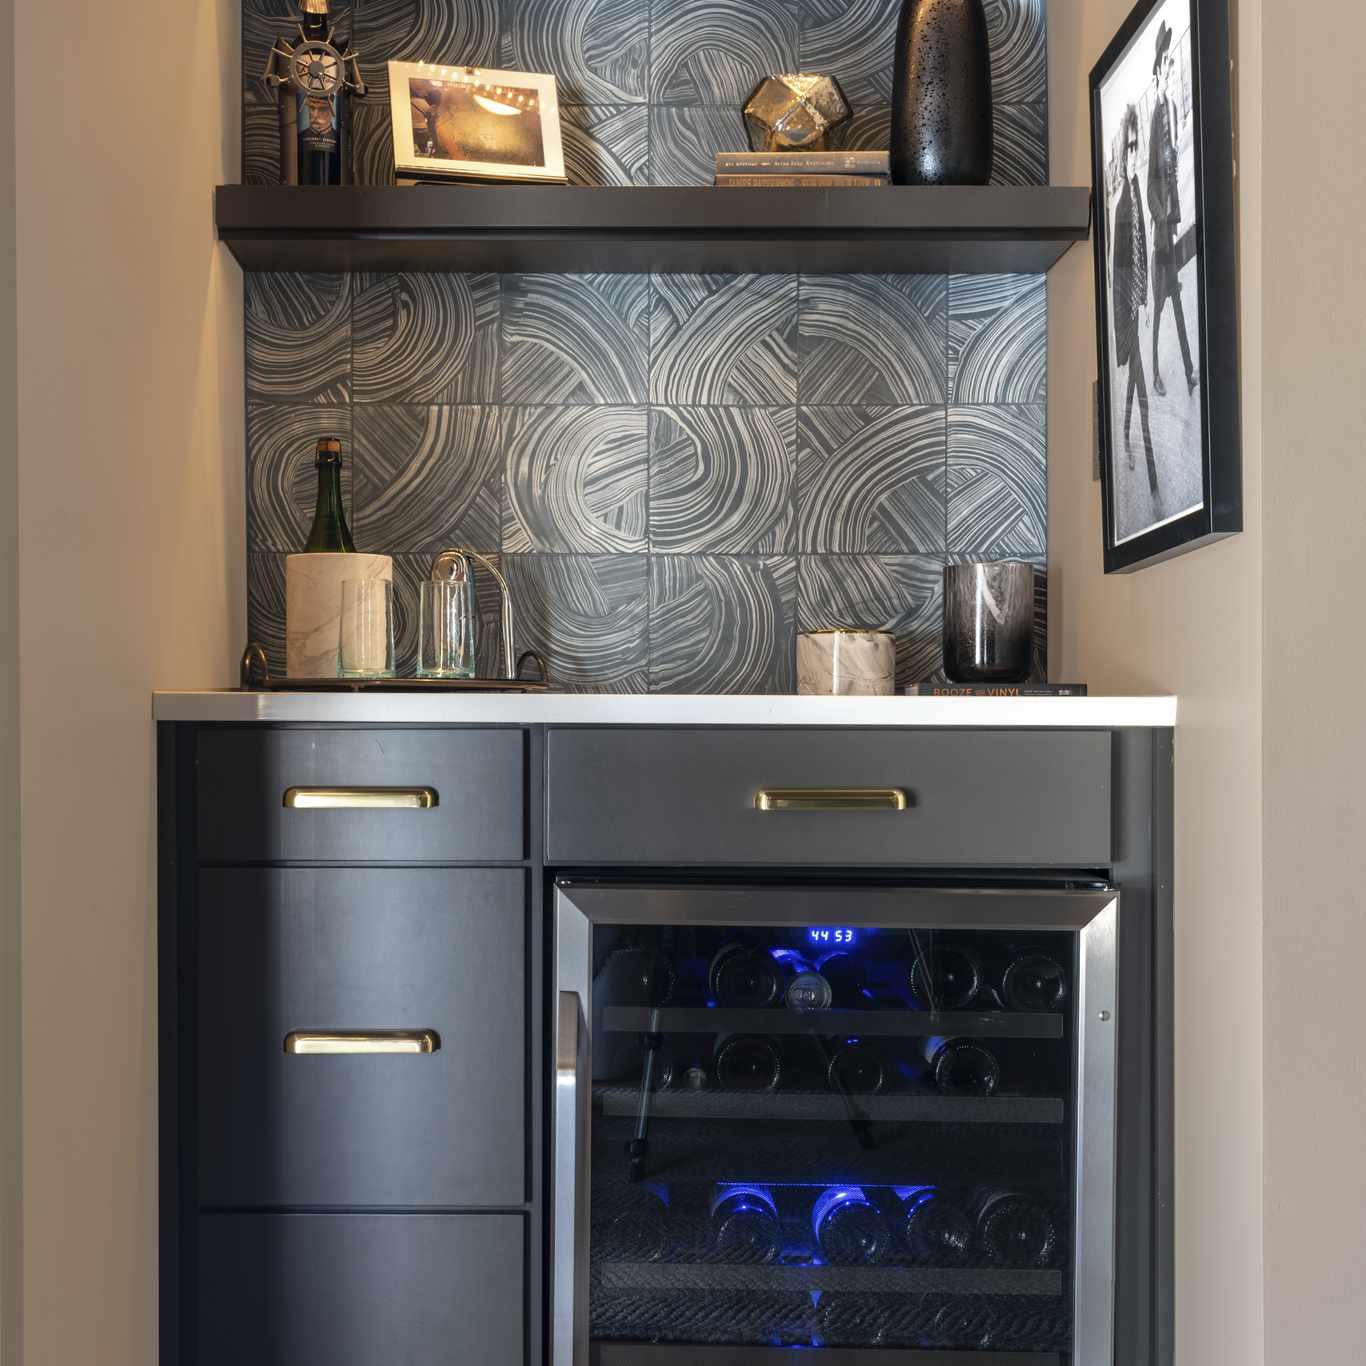 Mini wine fridge in small space